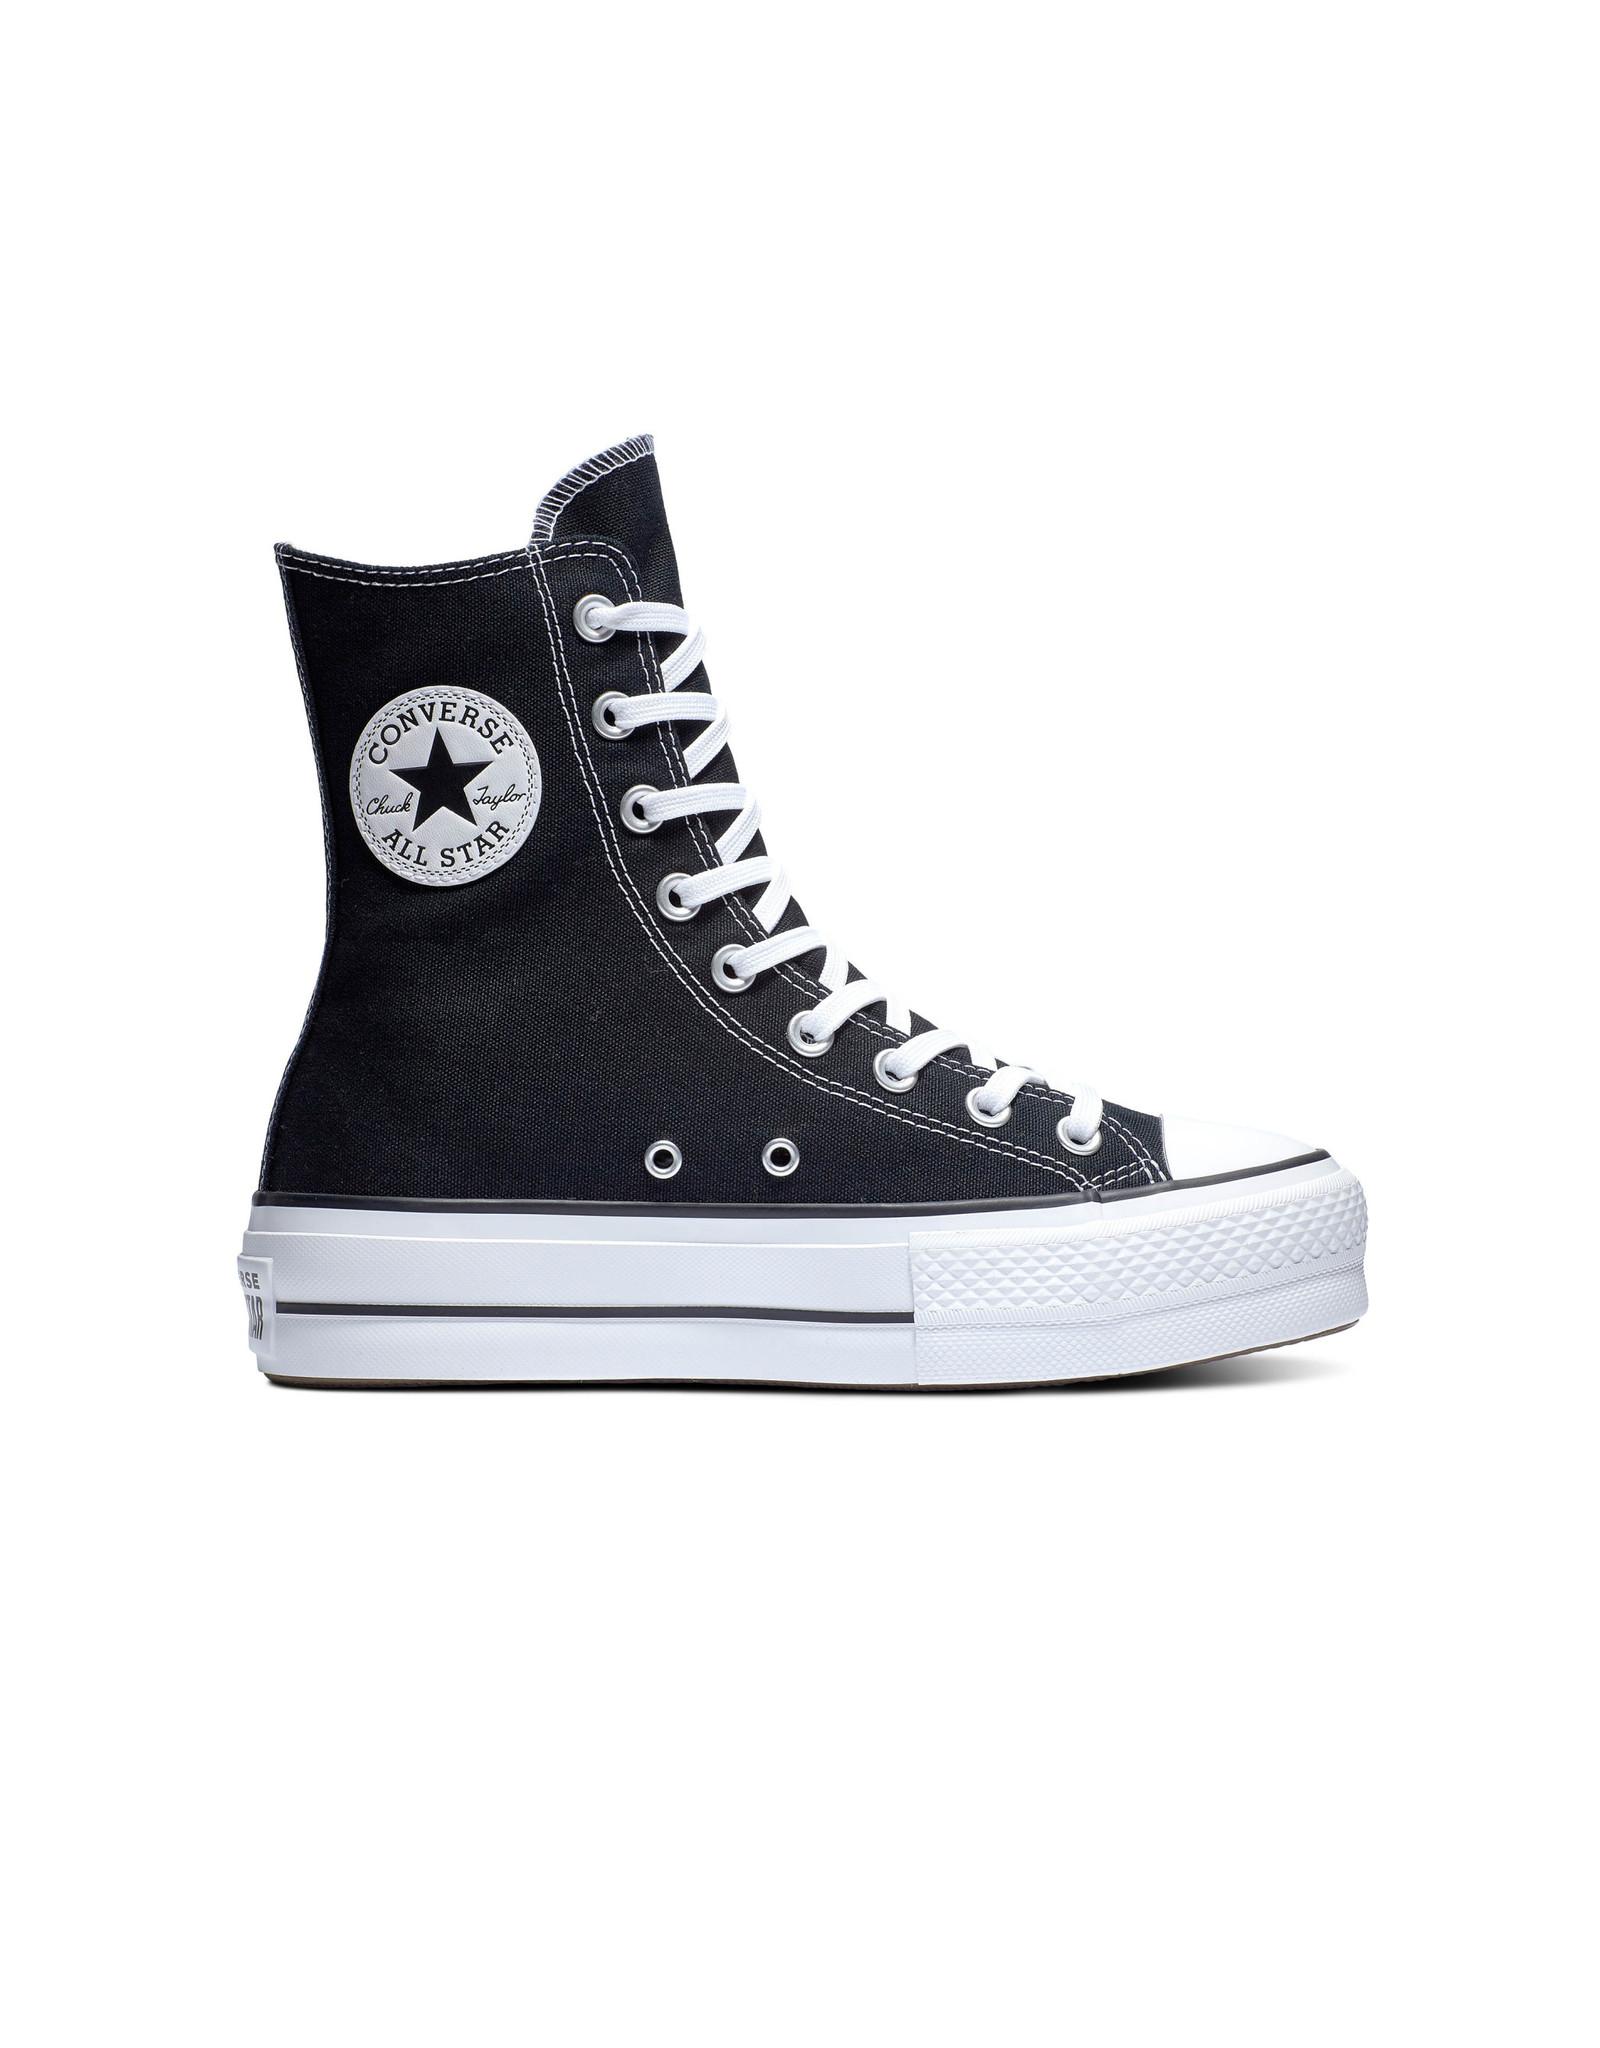 CONVERSE CTAS LIFT X-HI BLACK/WHITE/BLACK C120LB-170522C